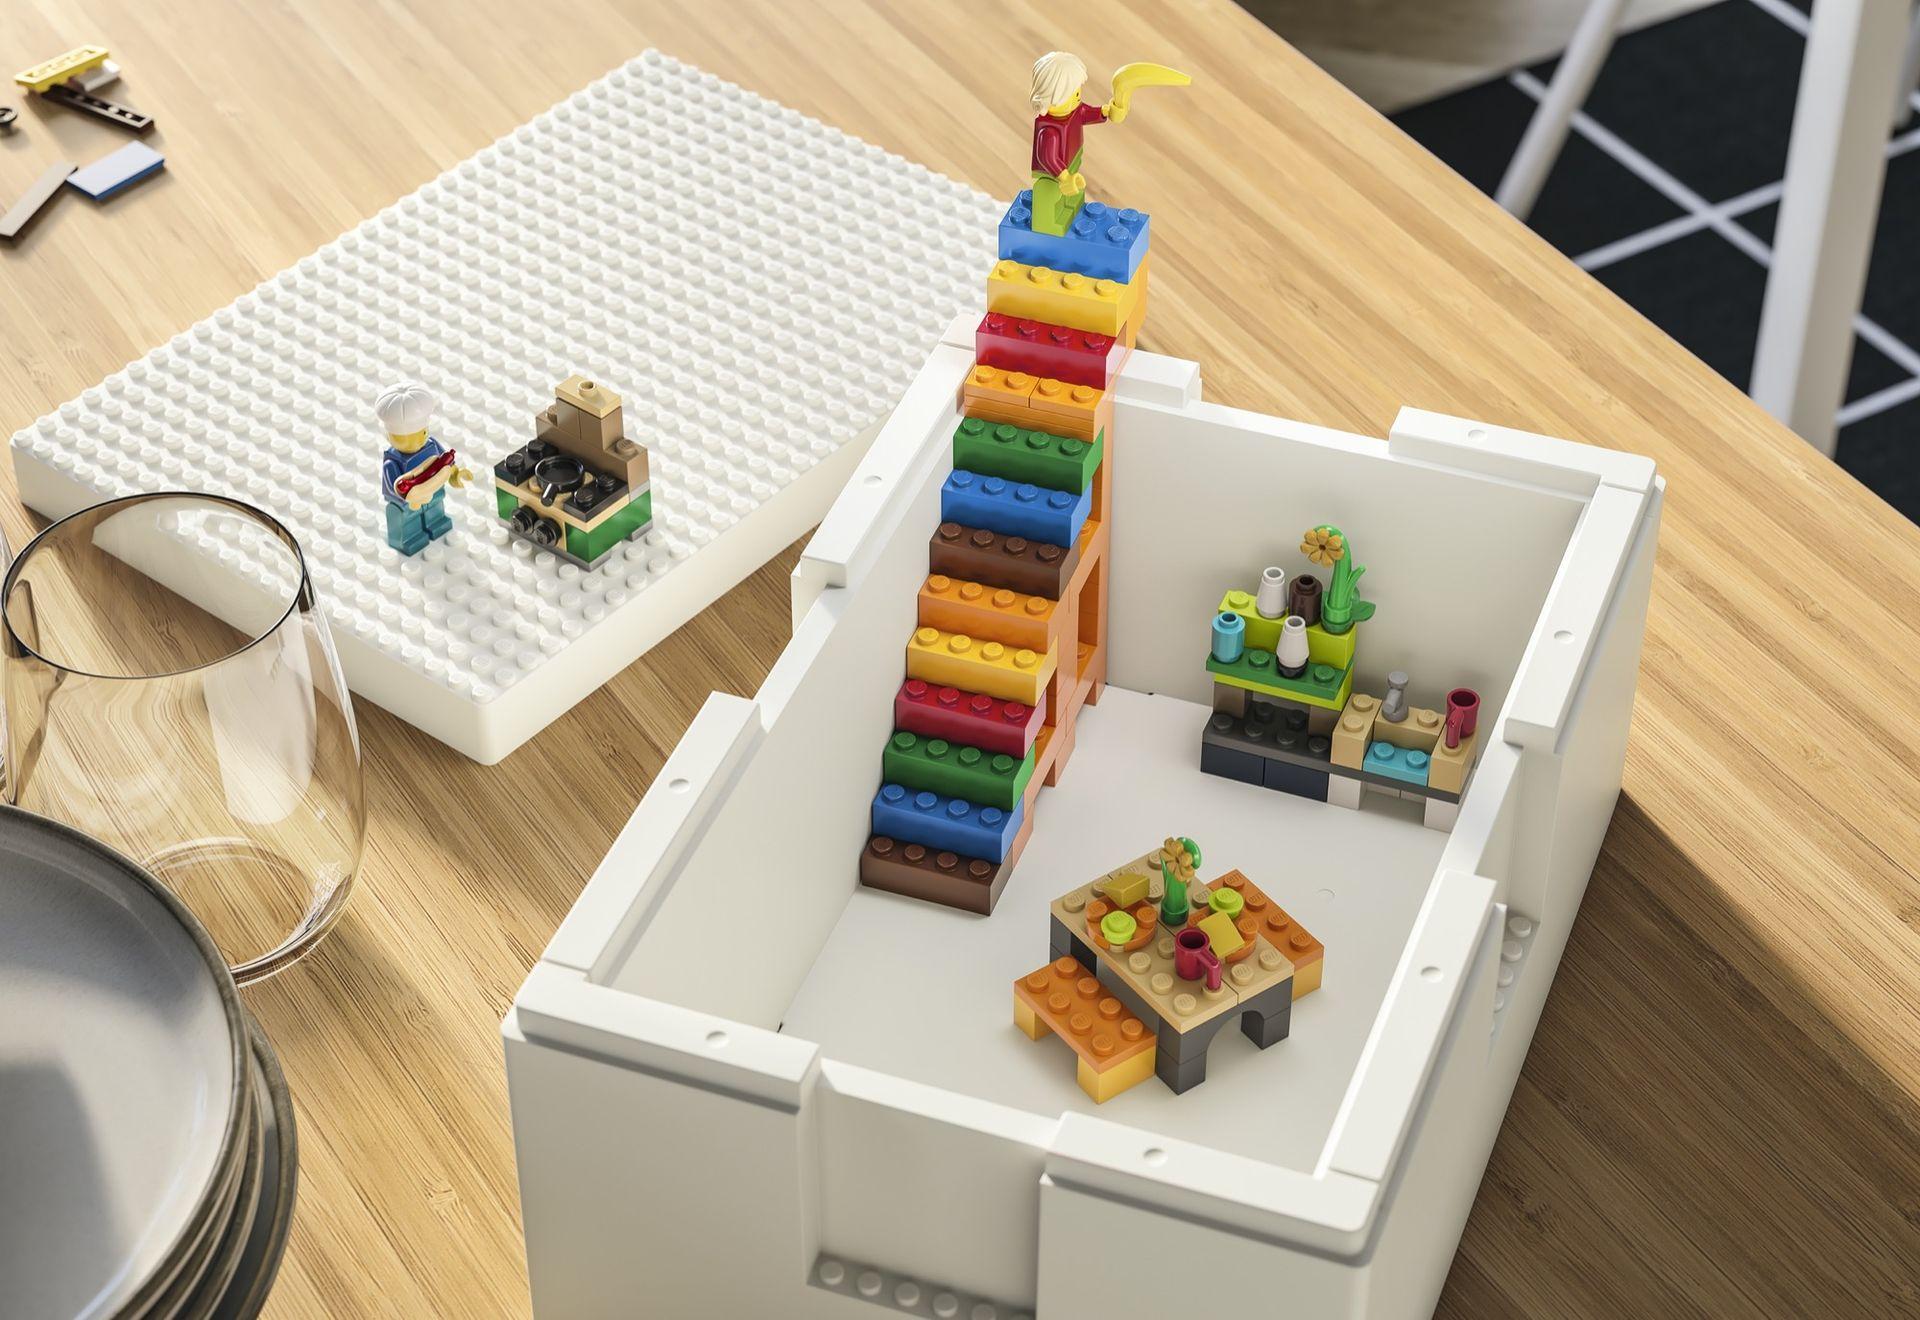 IKEA och LEGO presenterar Bygglek